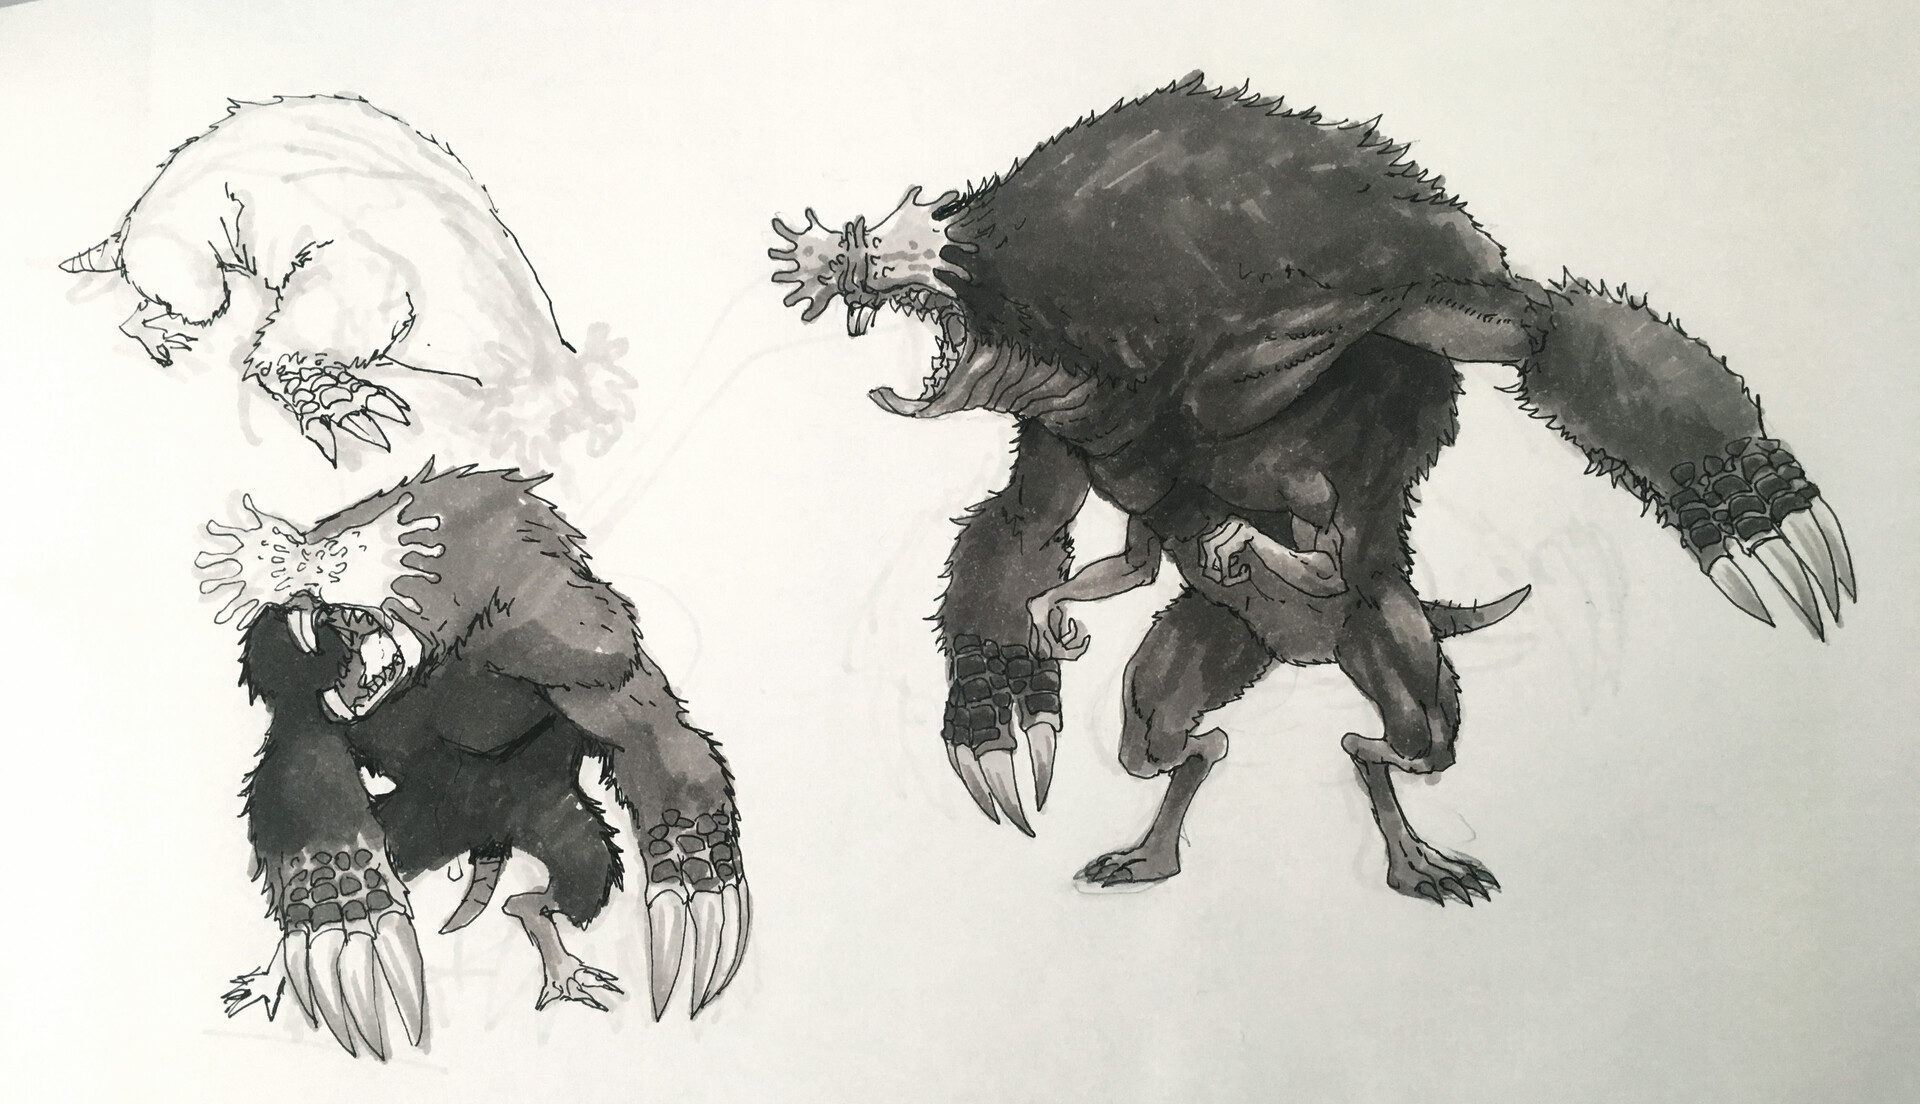 Original pen/marker sketch.